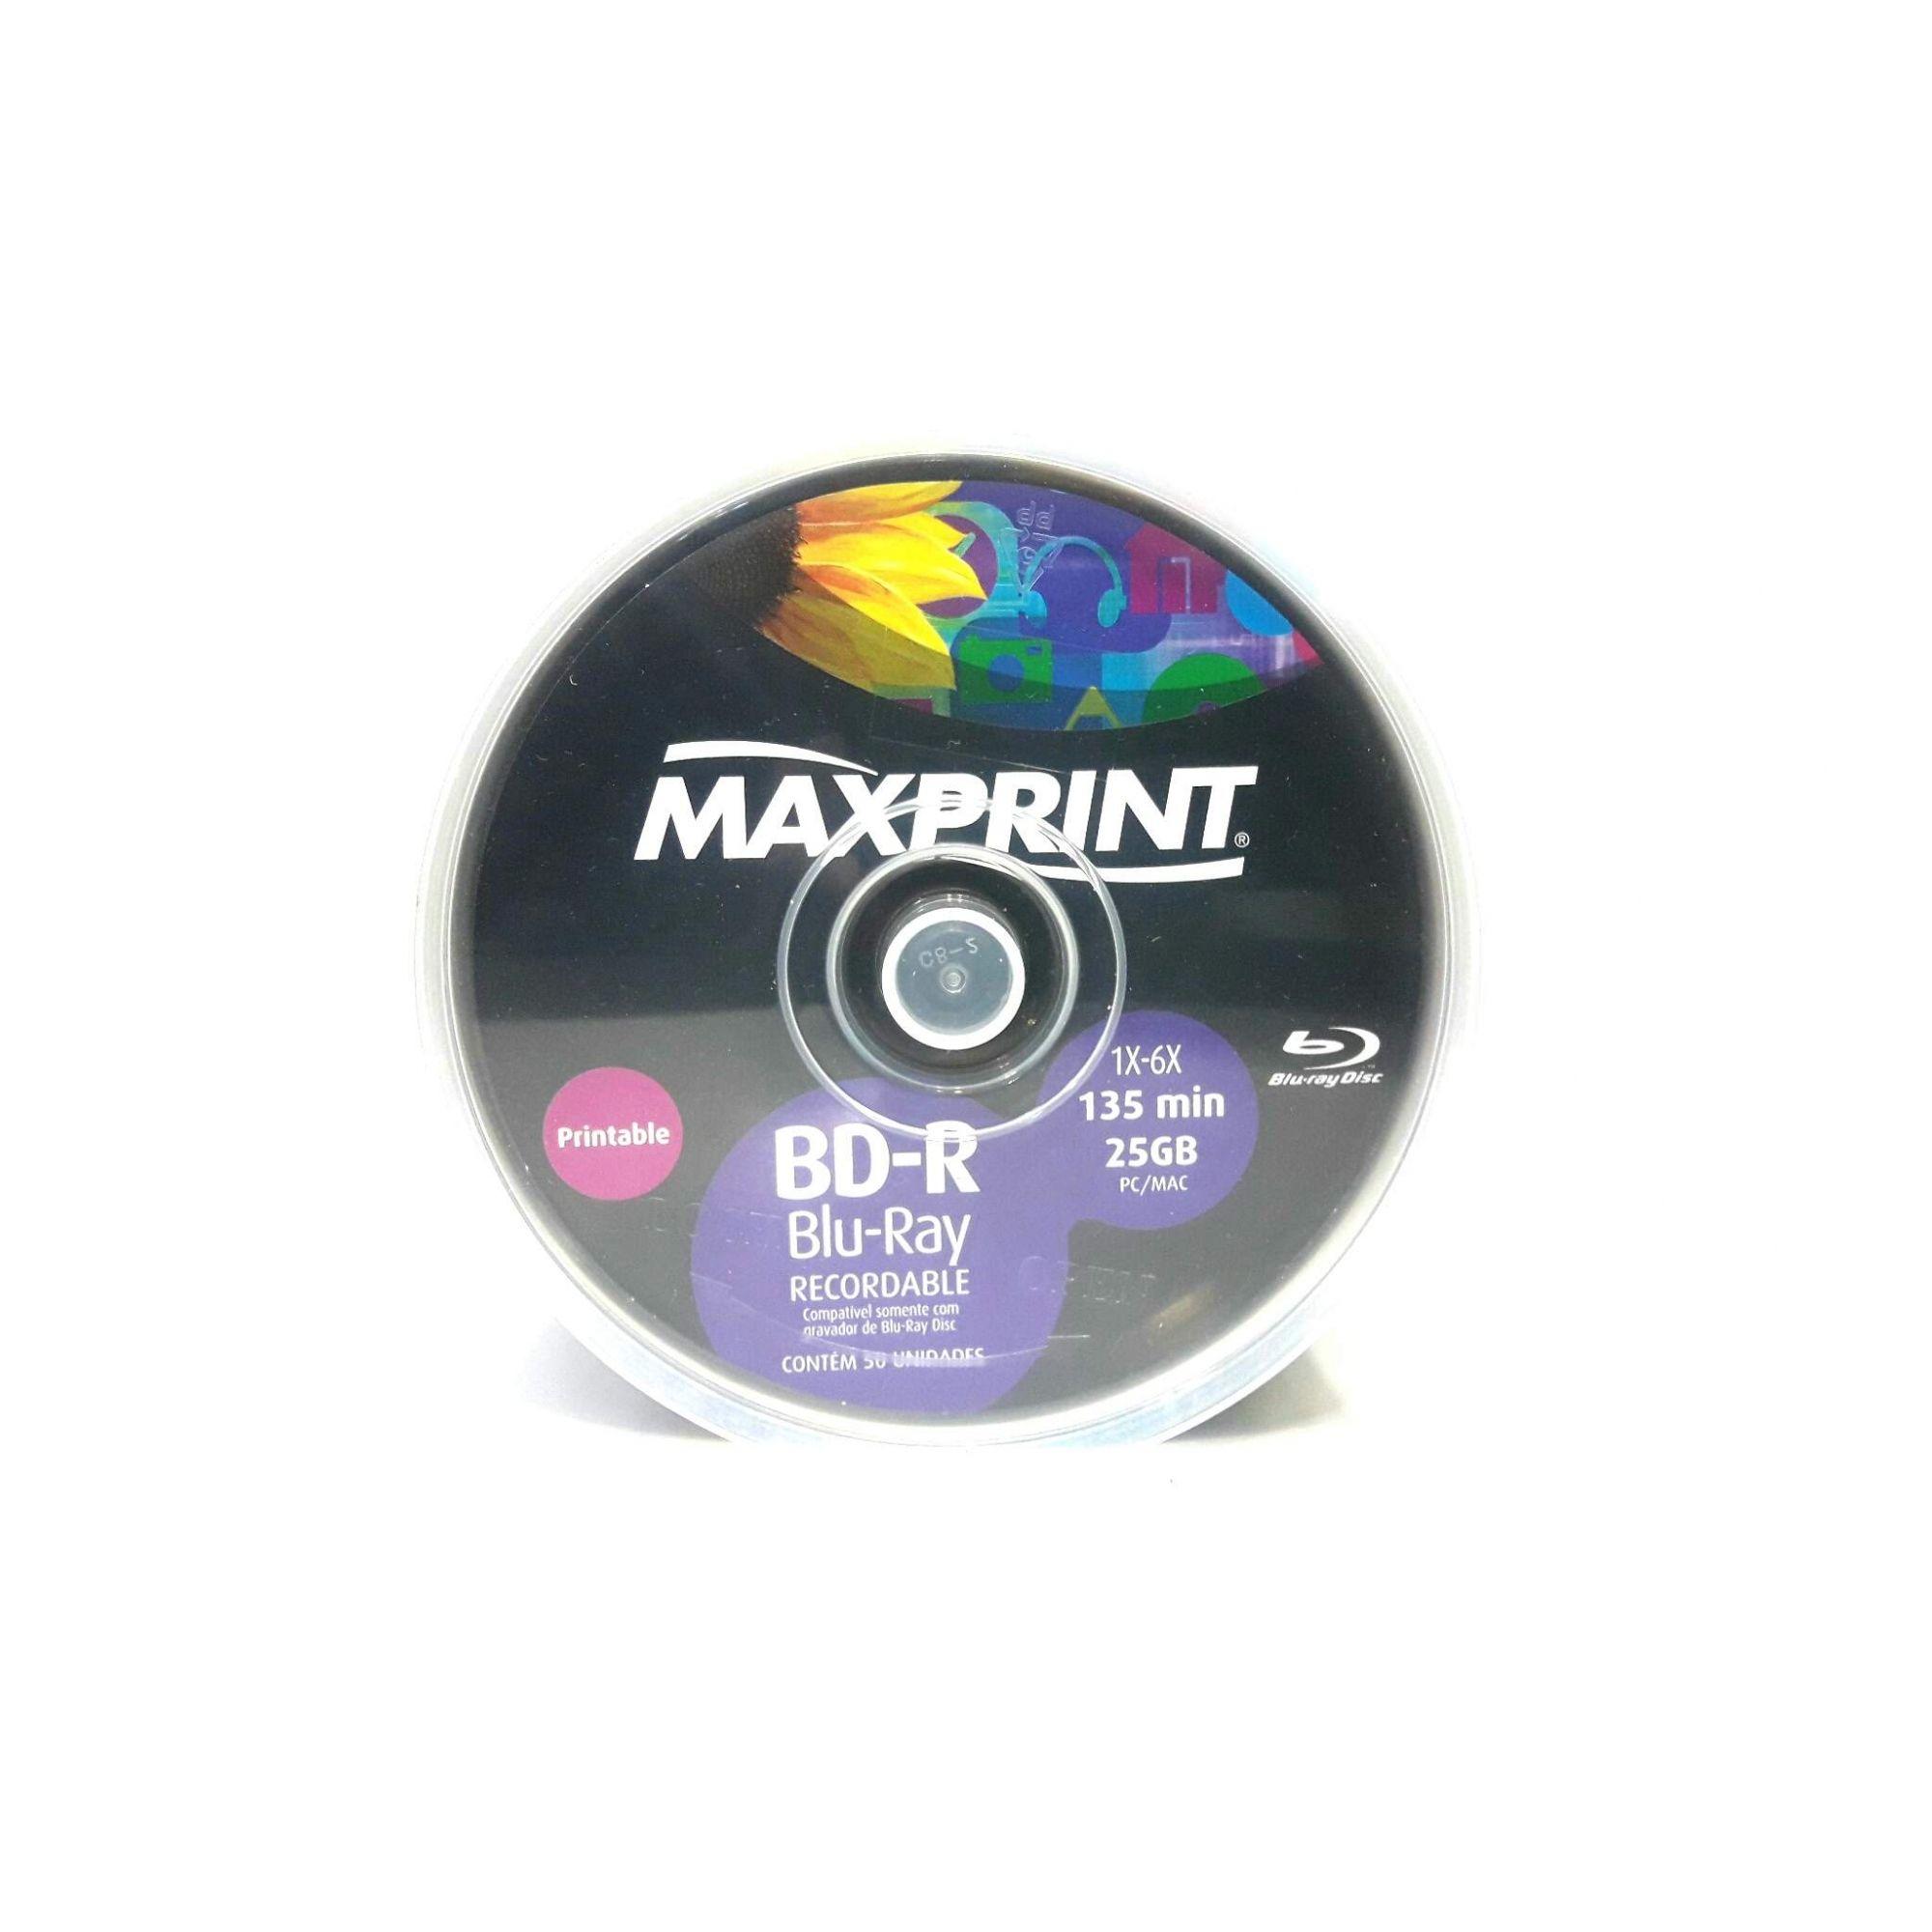 50 Mídia Virgem Bluray Bd-r Maxprint Printable 25gb 135min